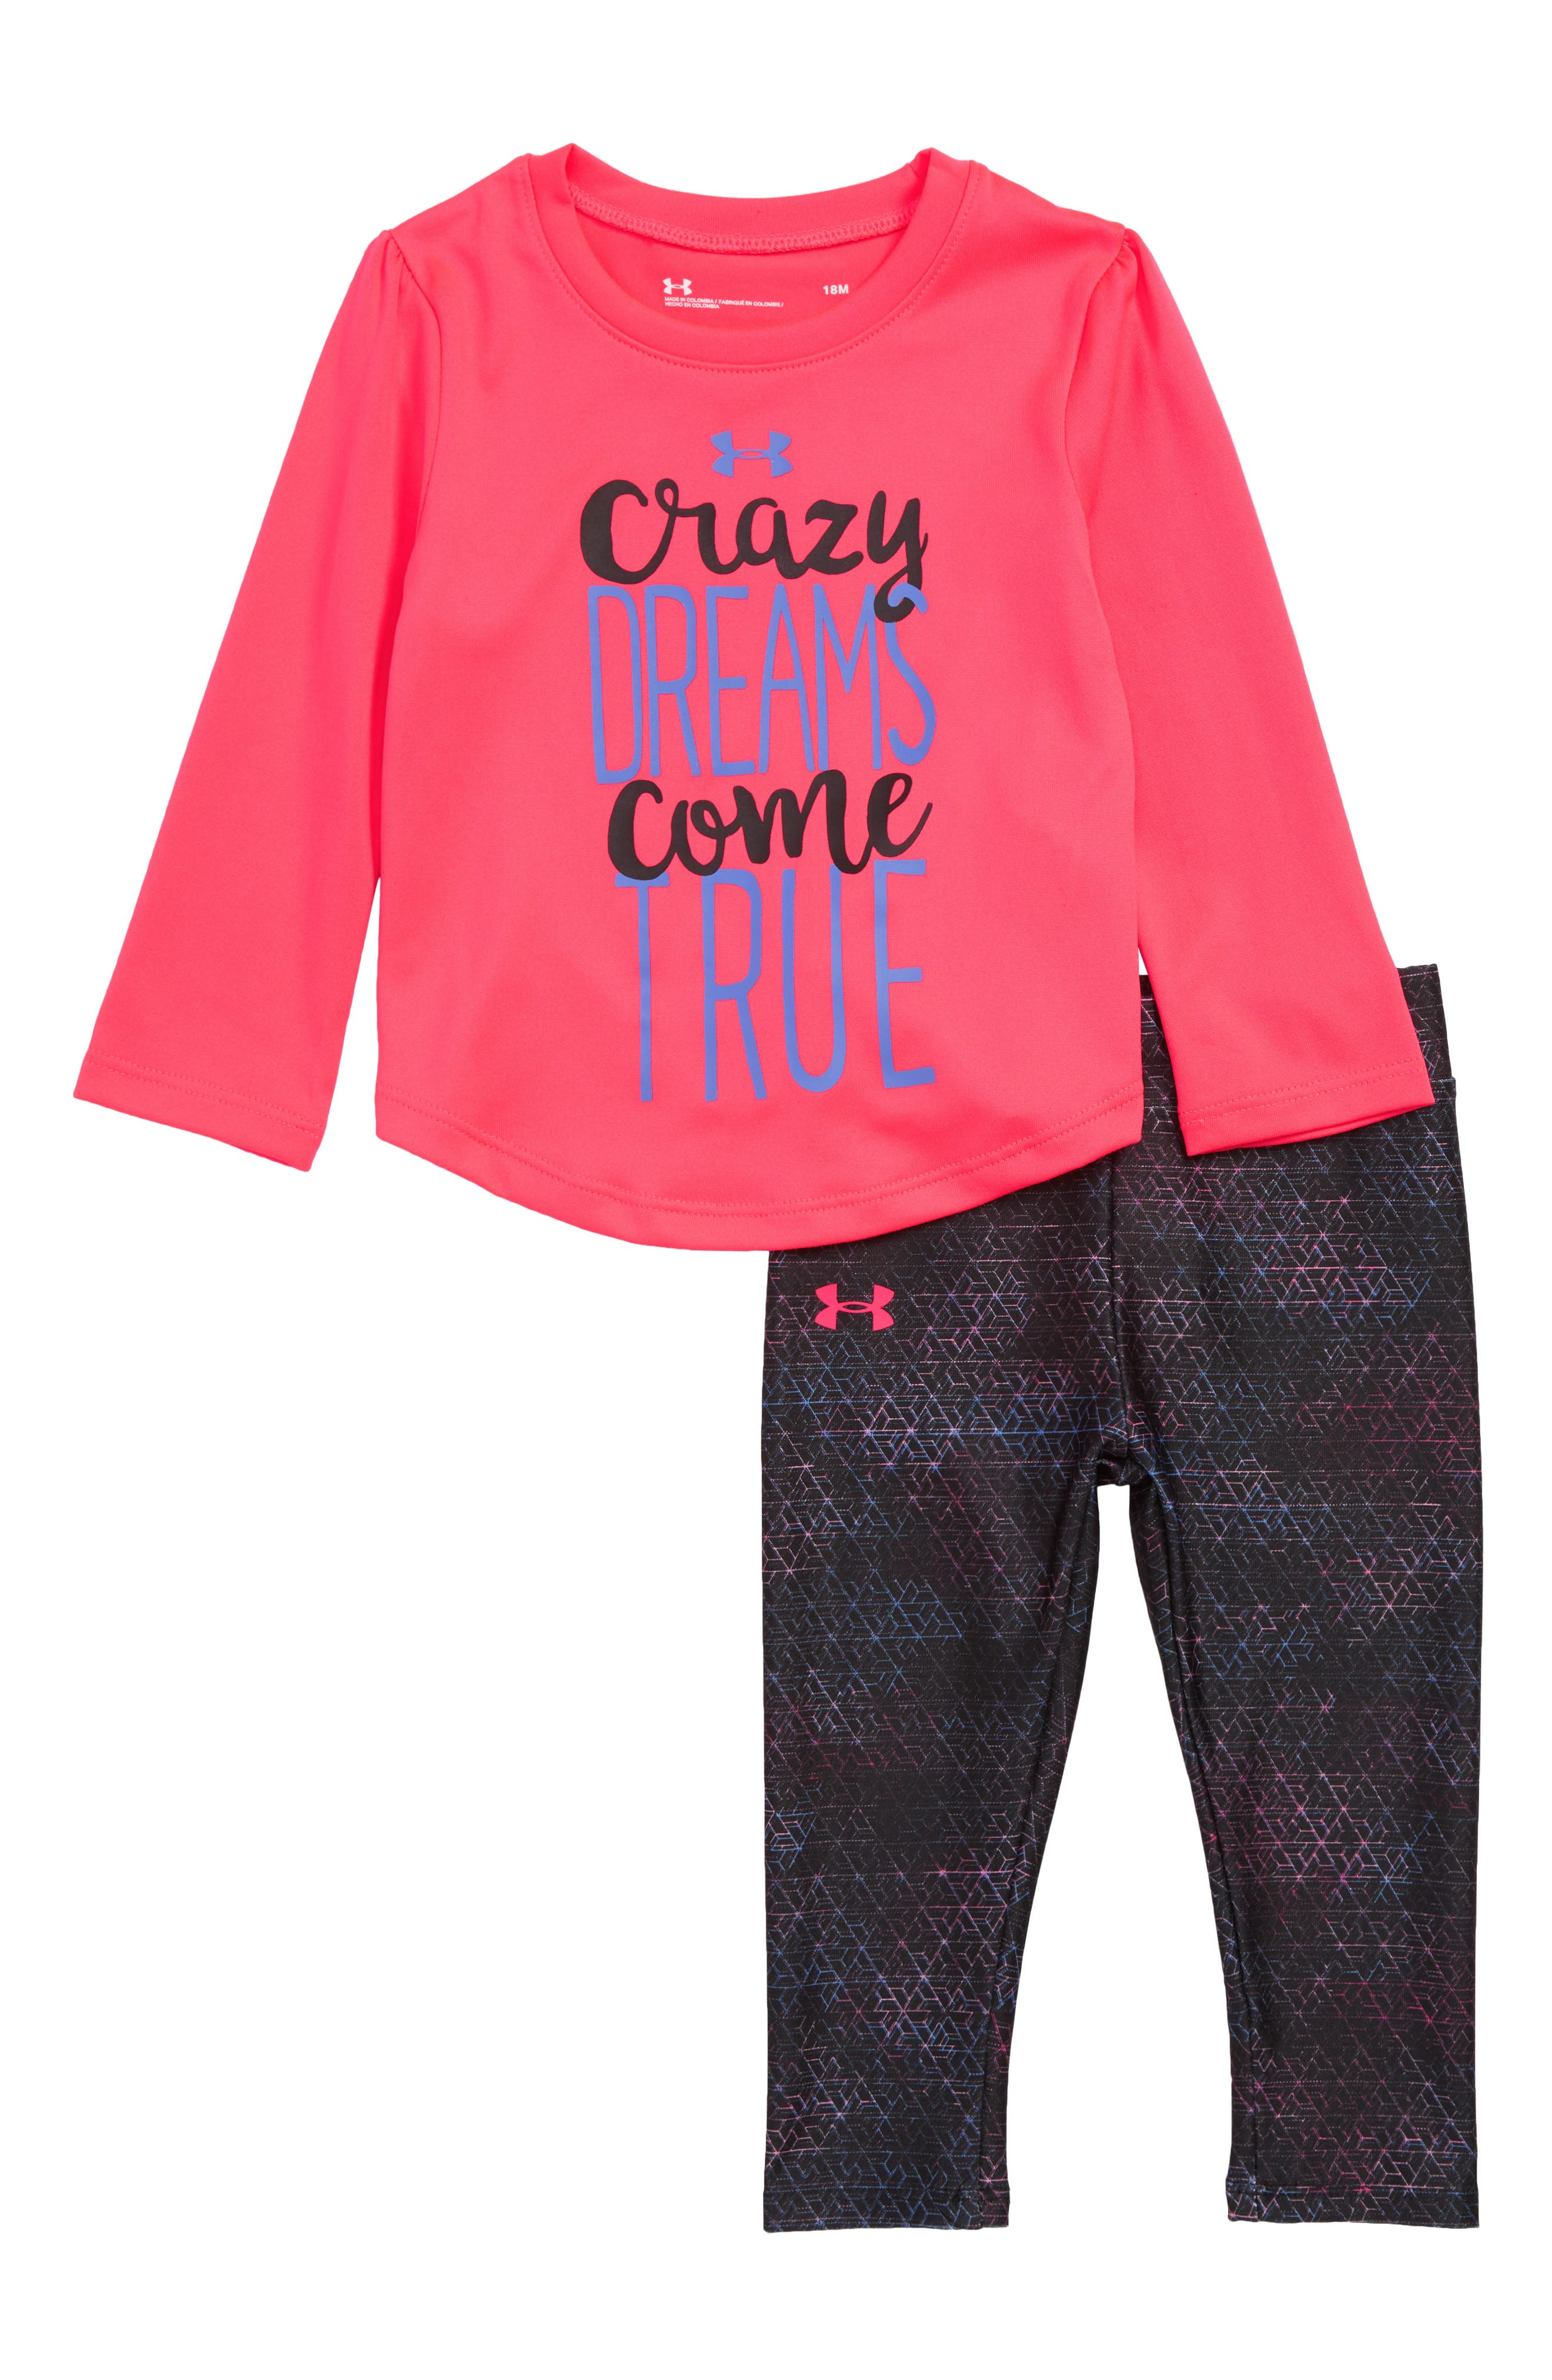 Crazy Dreams Come True Tee & Leggings Set,                         Main,                         color, PENTA PINK